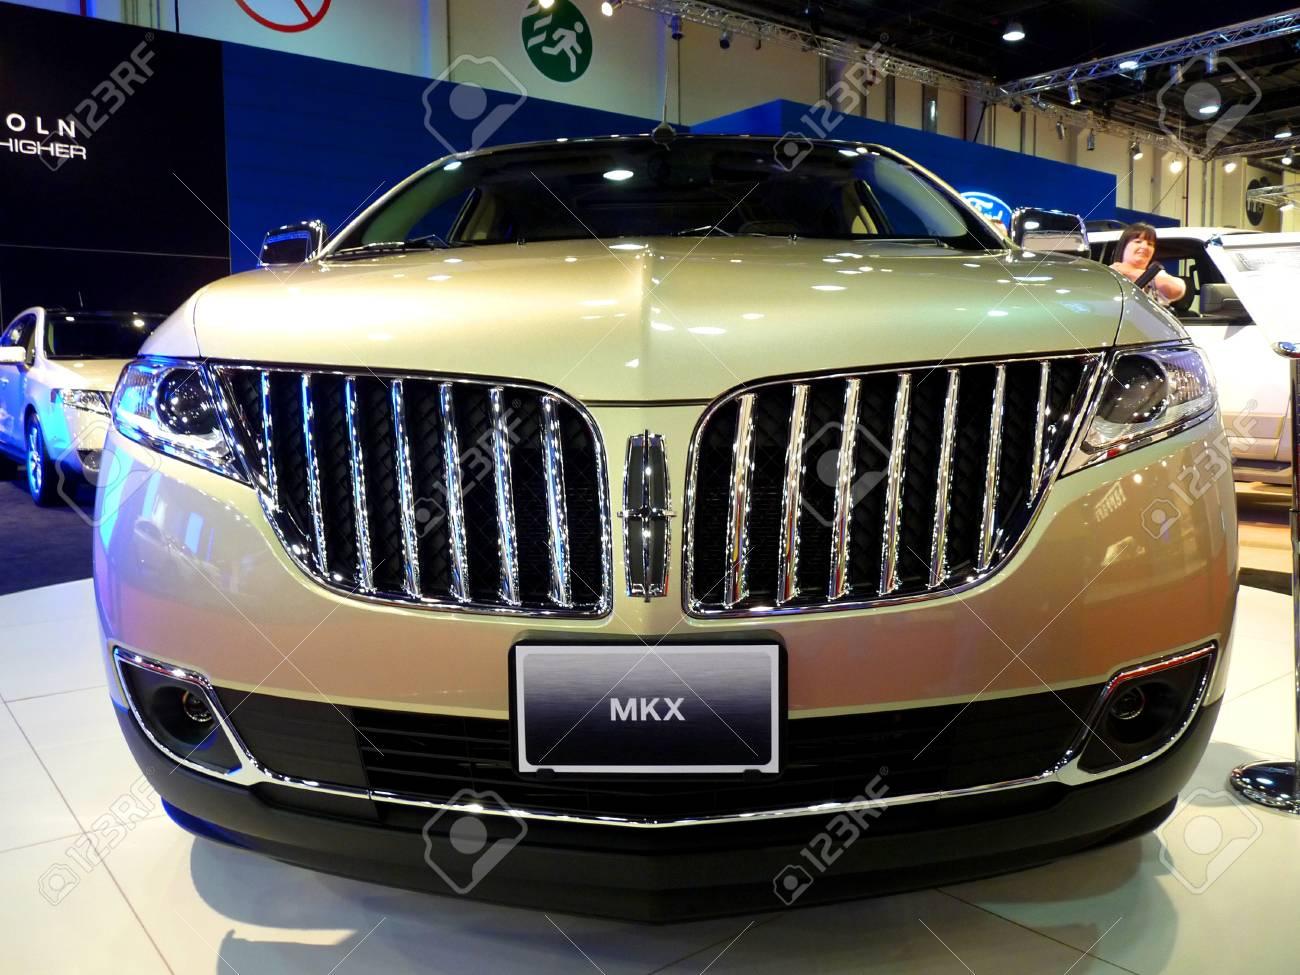 Abu Dhabi Uae December 10 Lincoln Mkx On Display During Abu